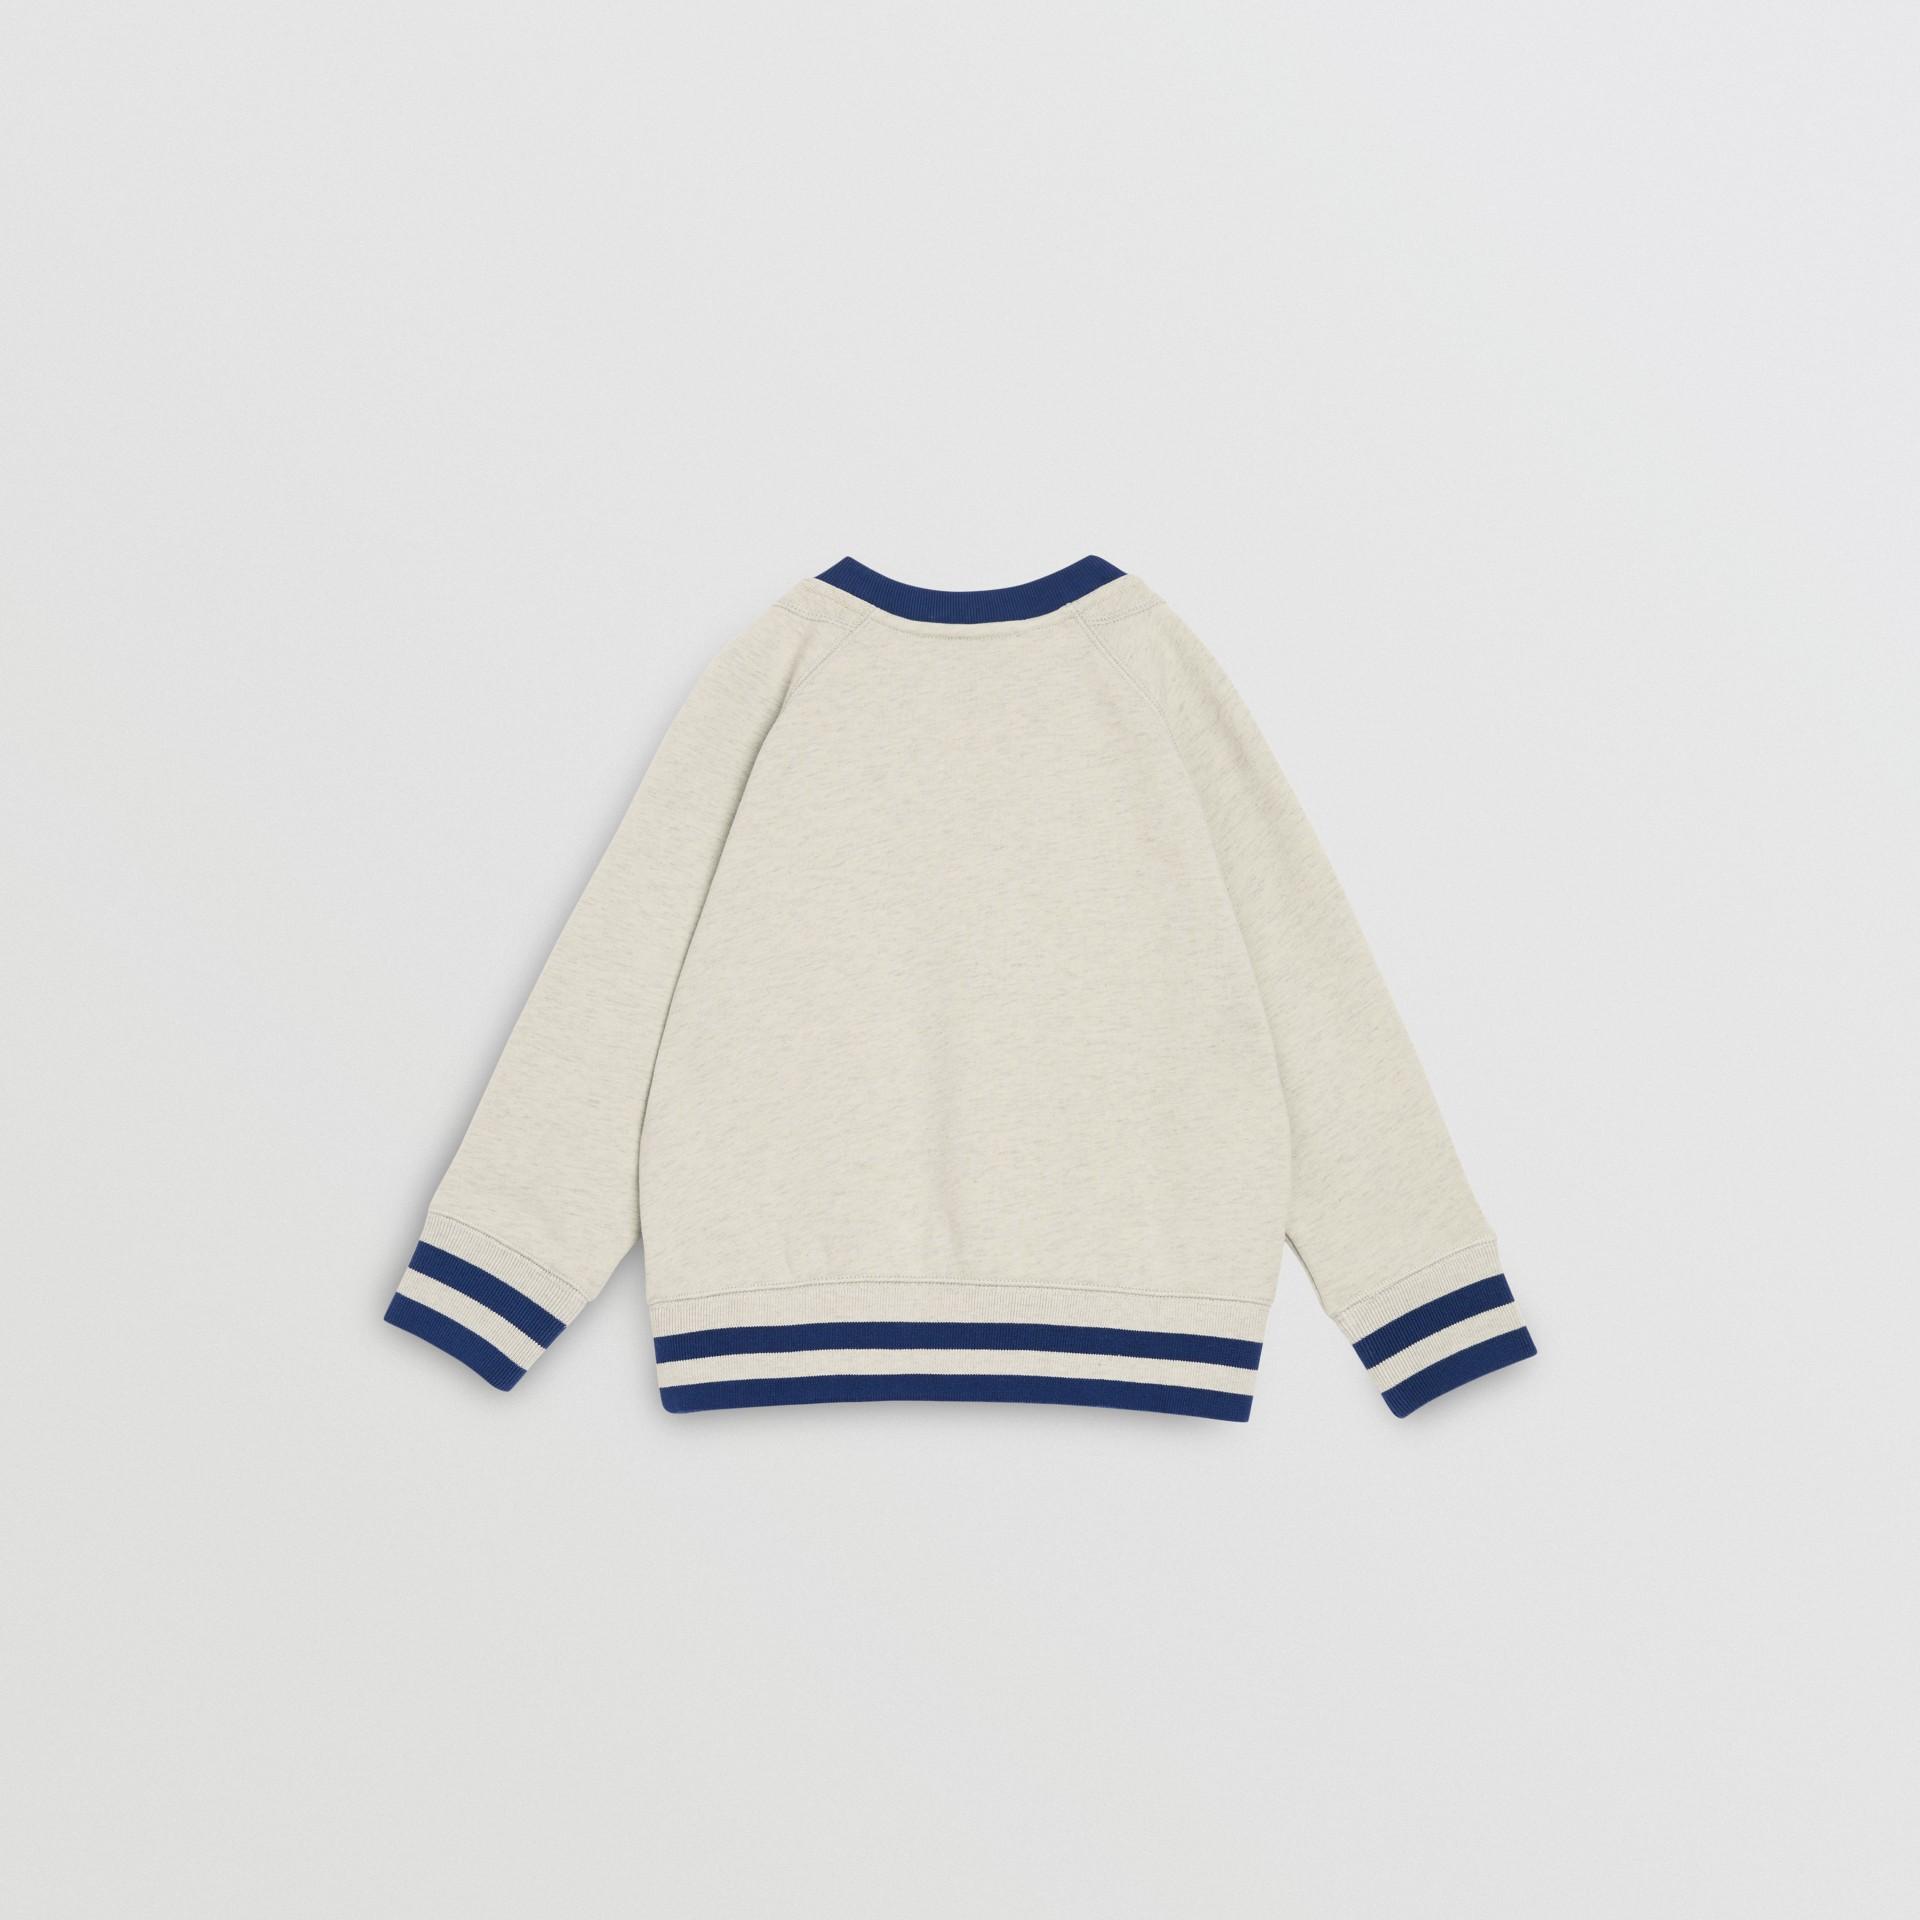 Check Appliqué Cotton Sweatshirt in Multicolour | Burberry - gallery image 3